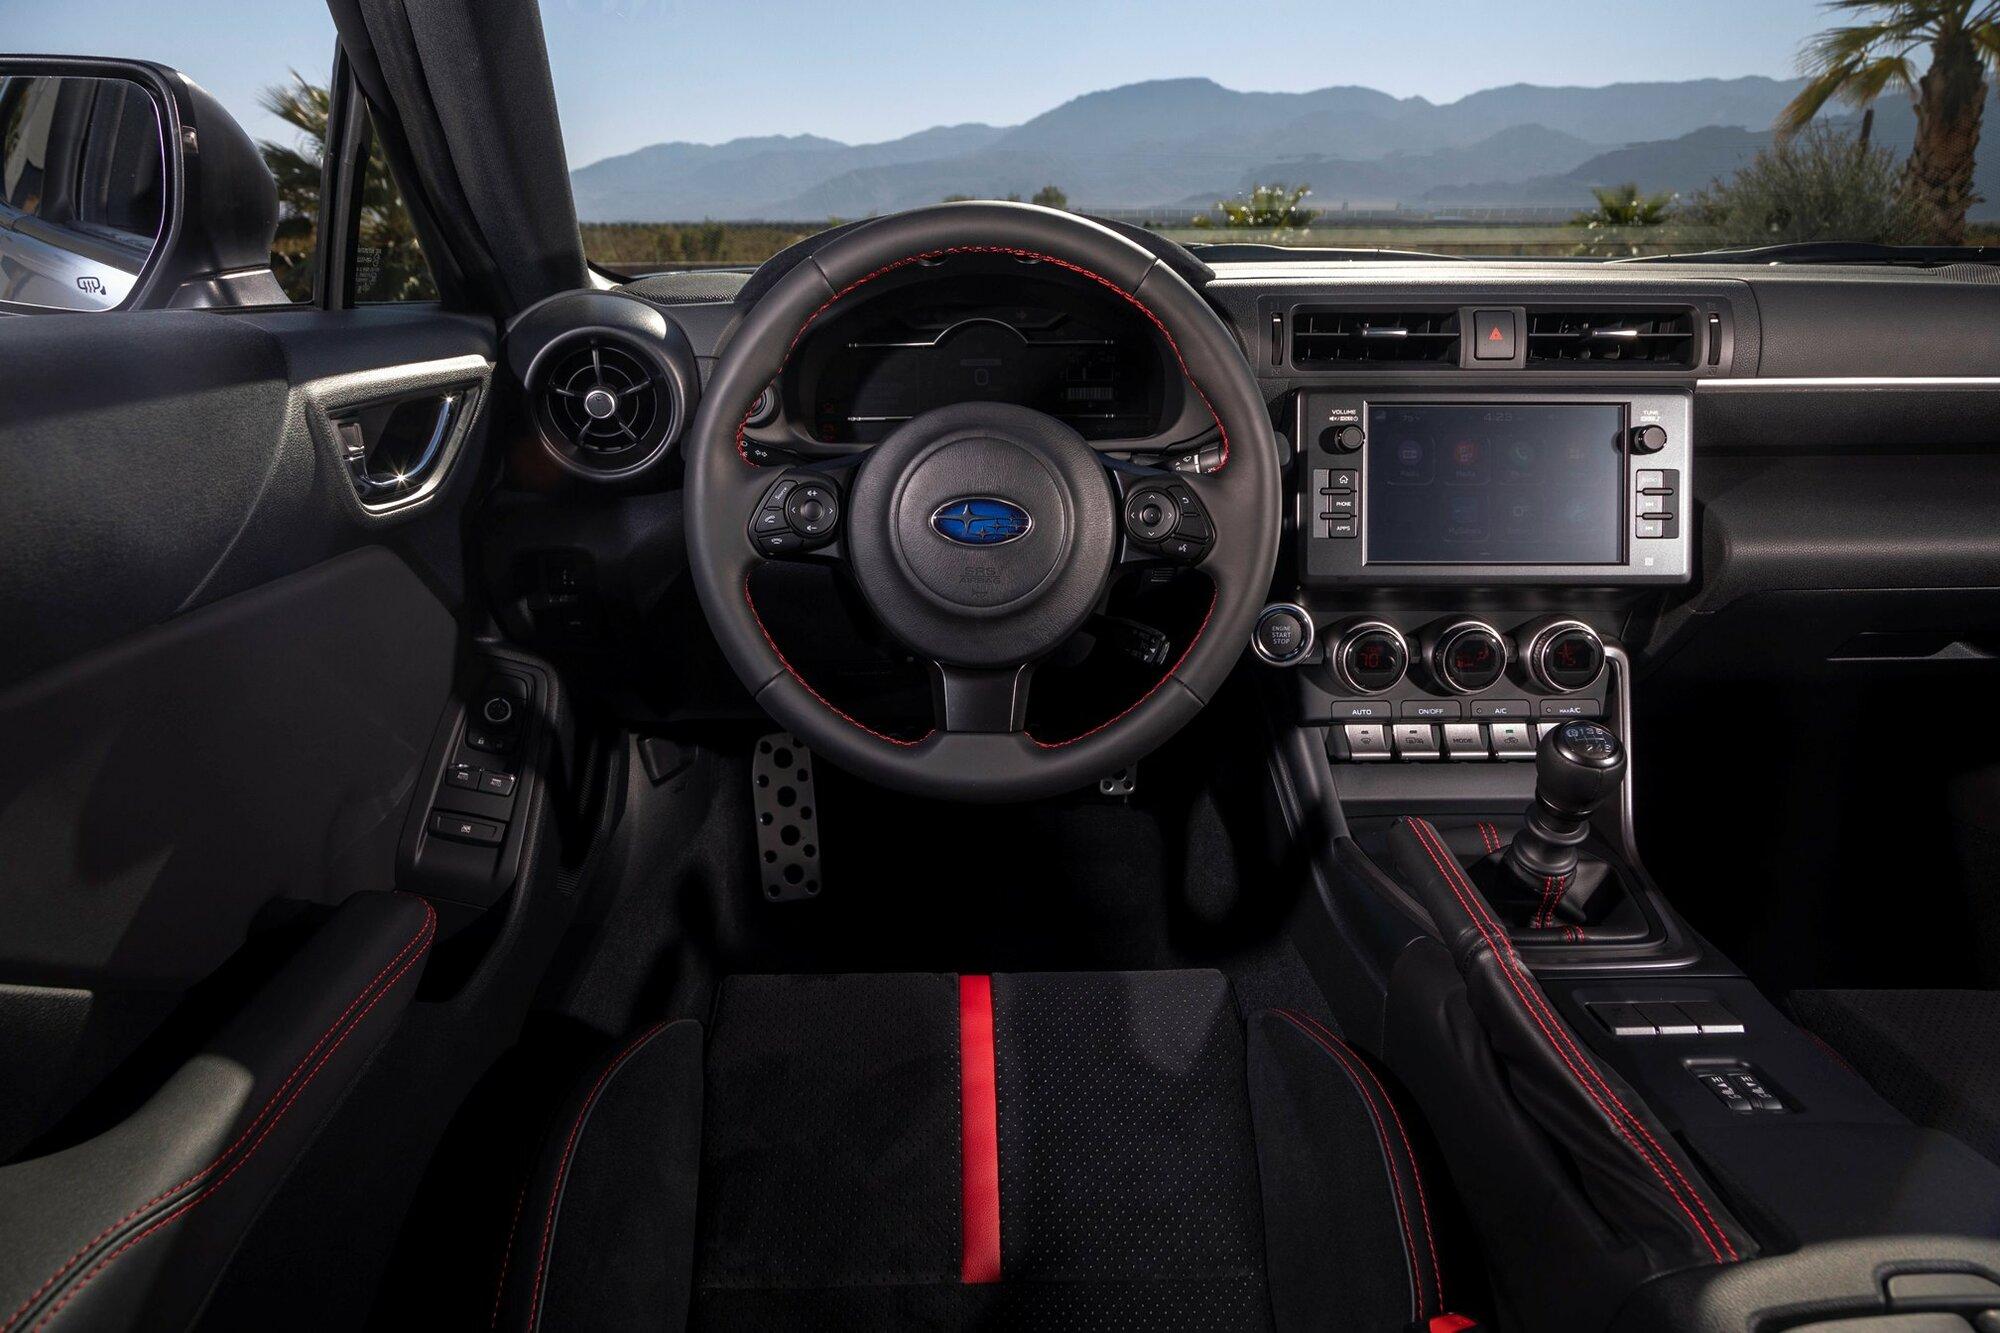 Nové Subaru BRZ doznalo řady změn v interiéru, zejména zaujme nový infotainment